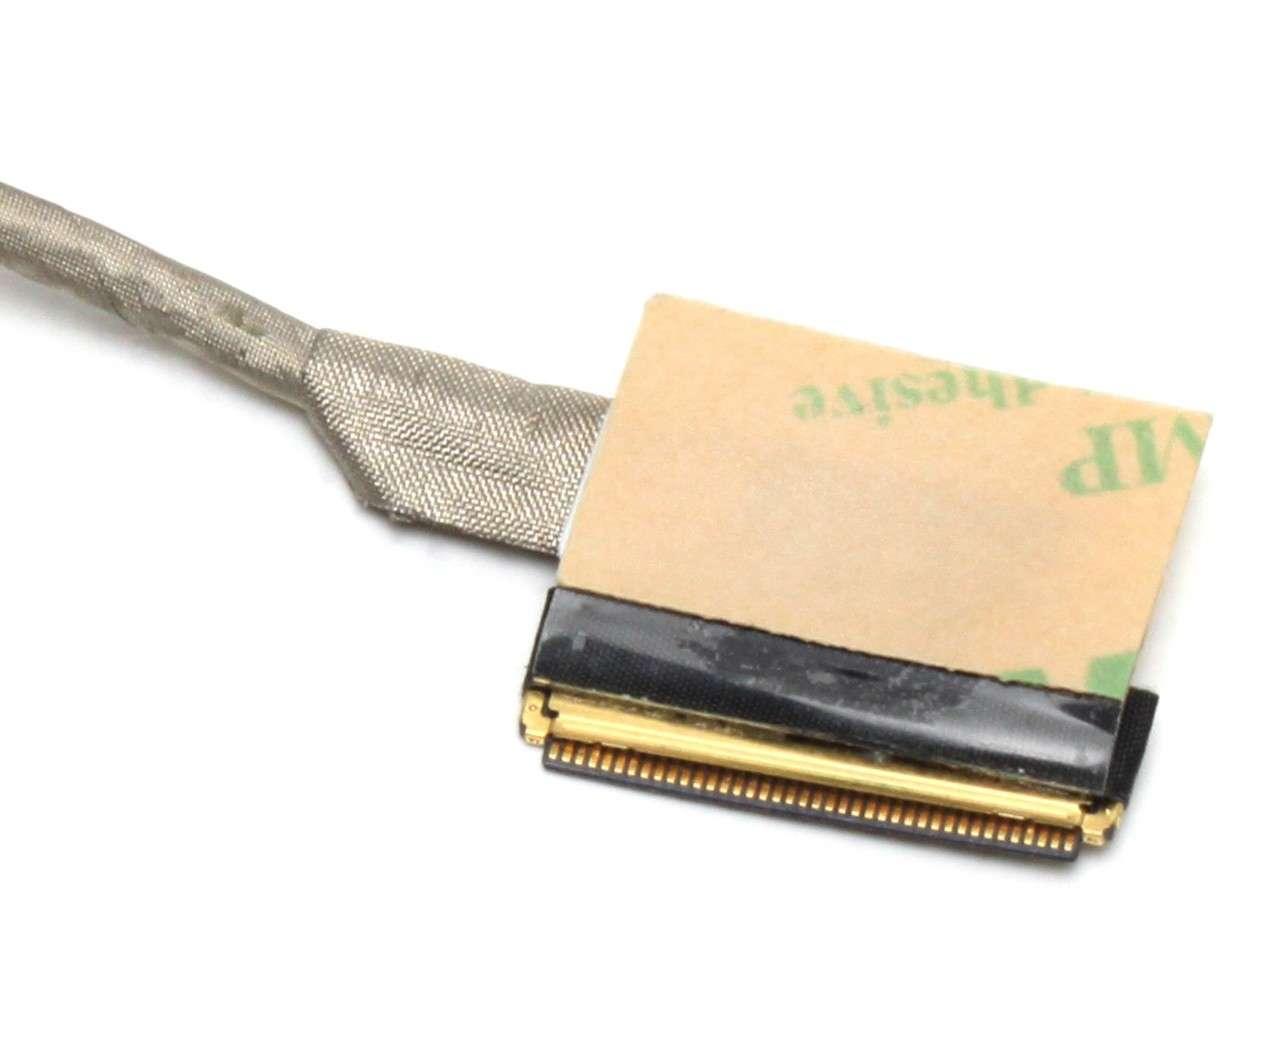 Cablu video LVDS Lenovo 04W1618 HD Plus 1600x900 imagine